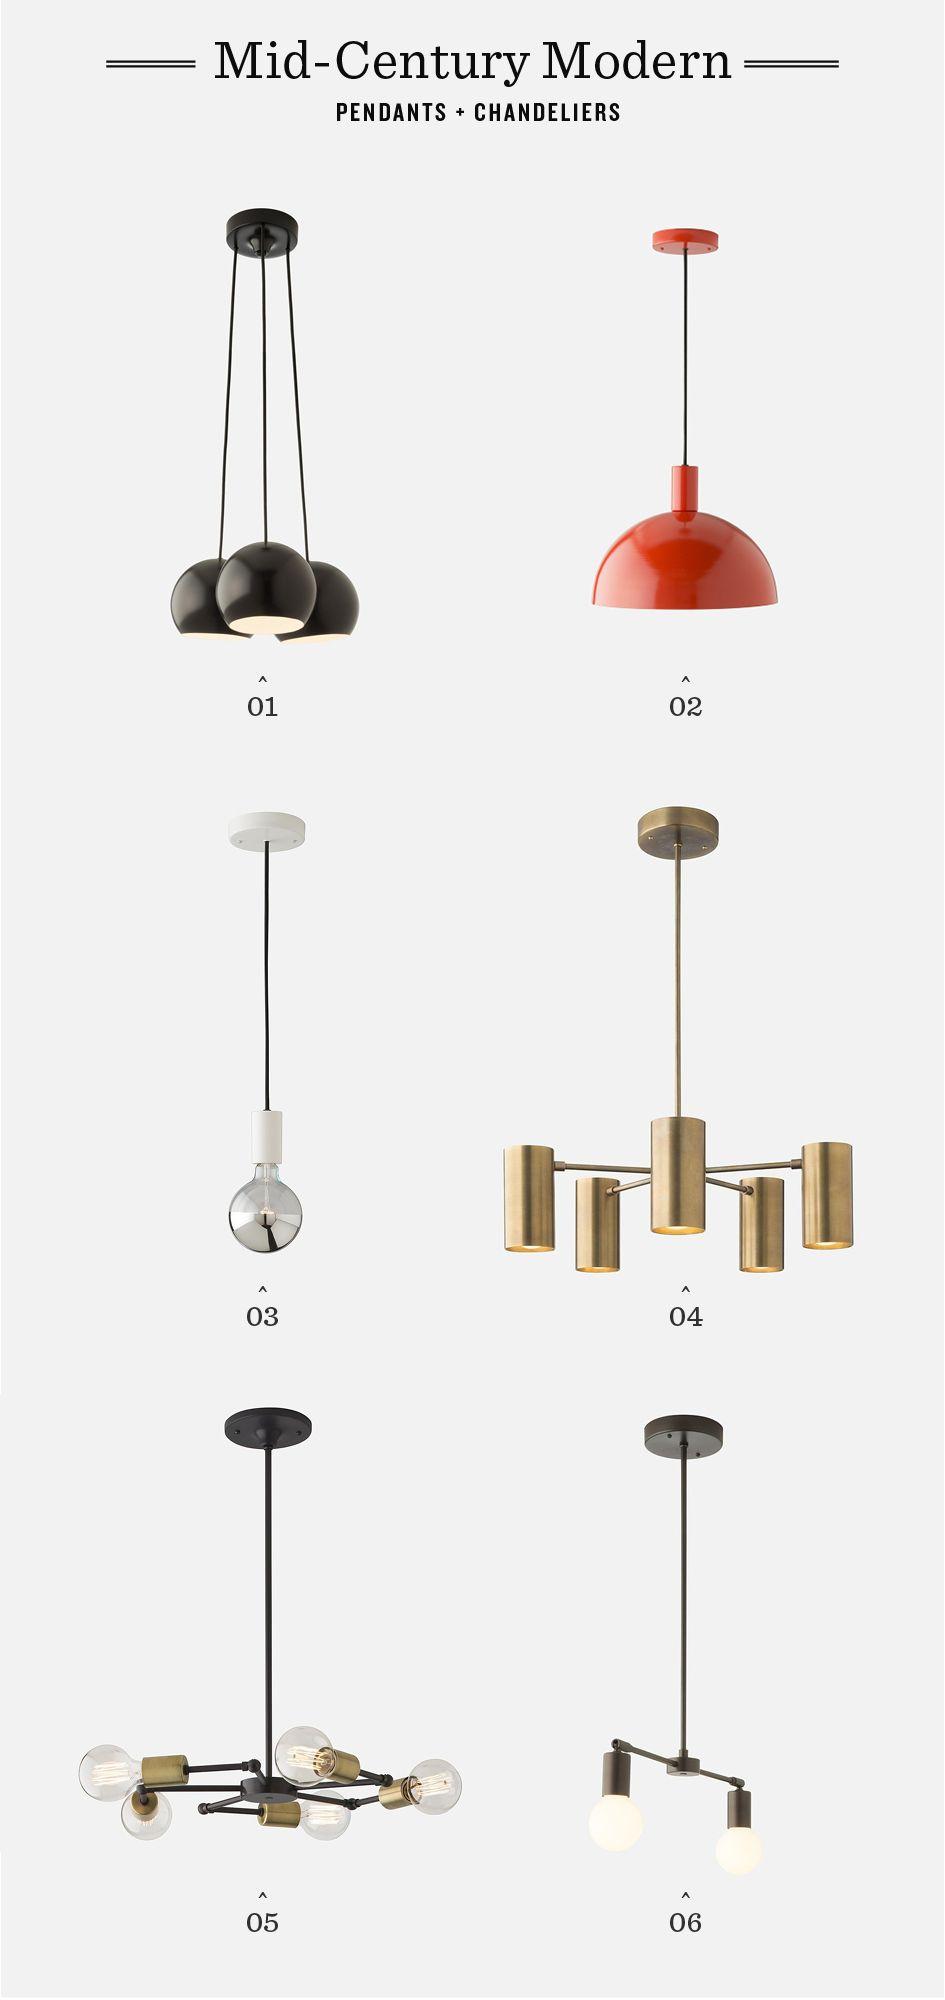 Shop MidCentury Modern Pendants Chandeliers by Schoolhouse – Shop Chandeliers